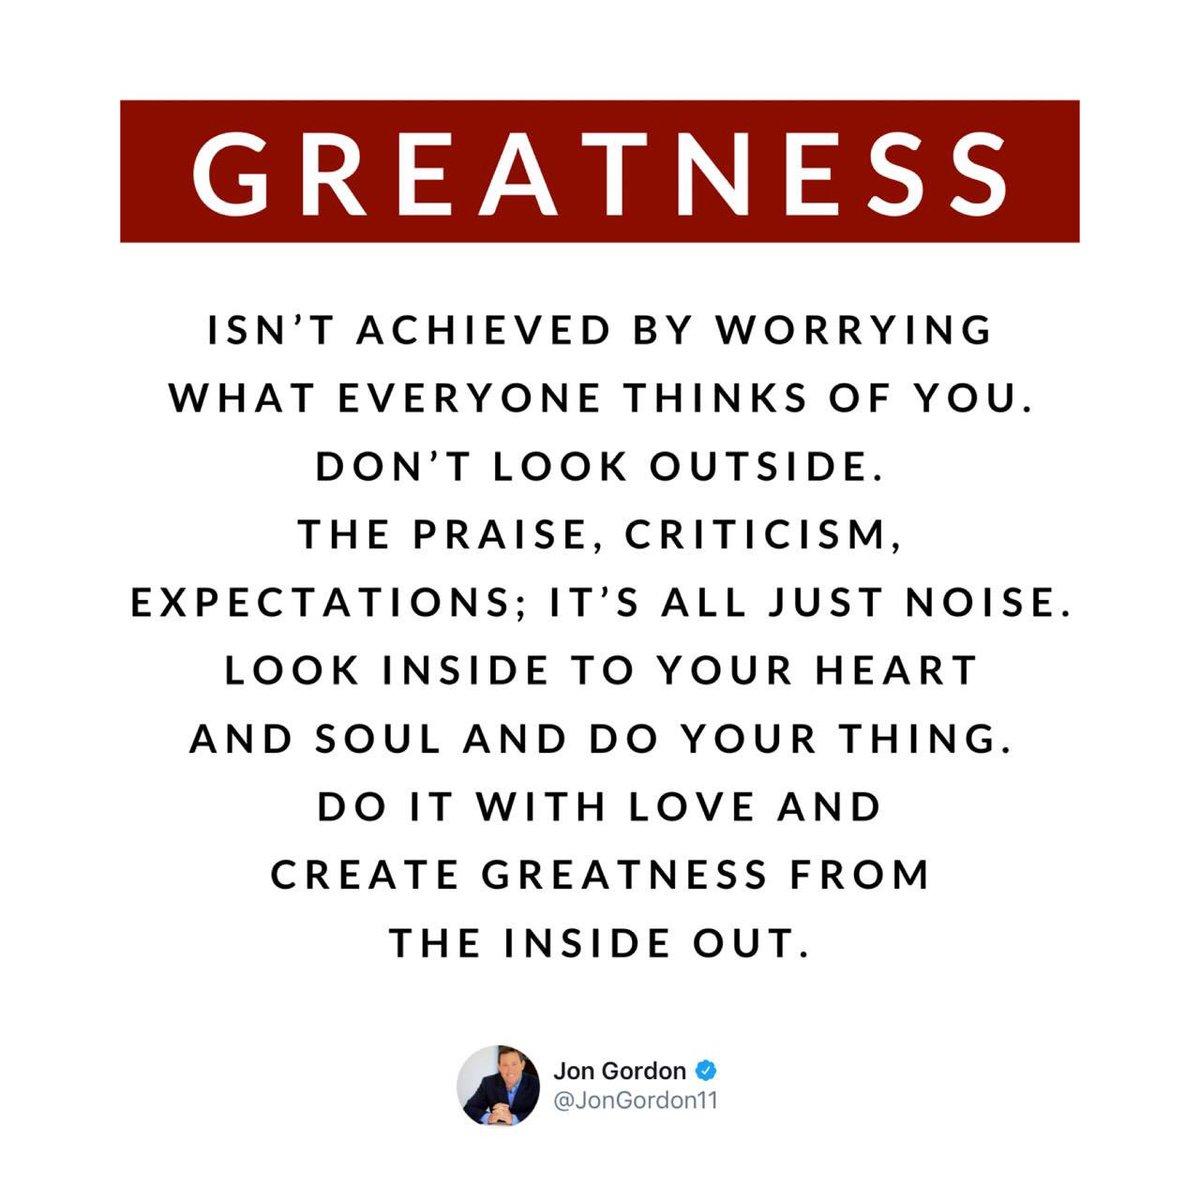 Advice that is life changing! Thanks for the reminder, @JonGordon11 #JoyfulLeaders